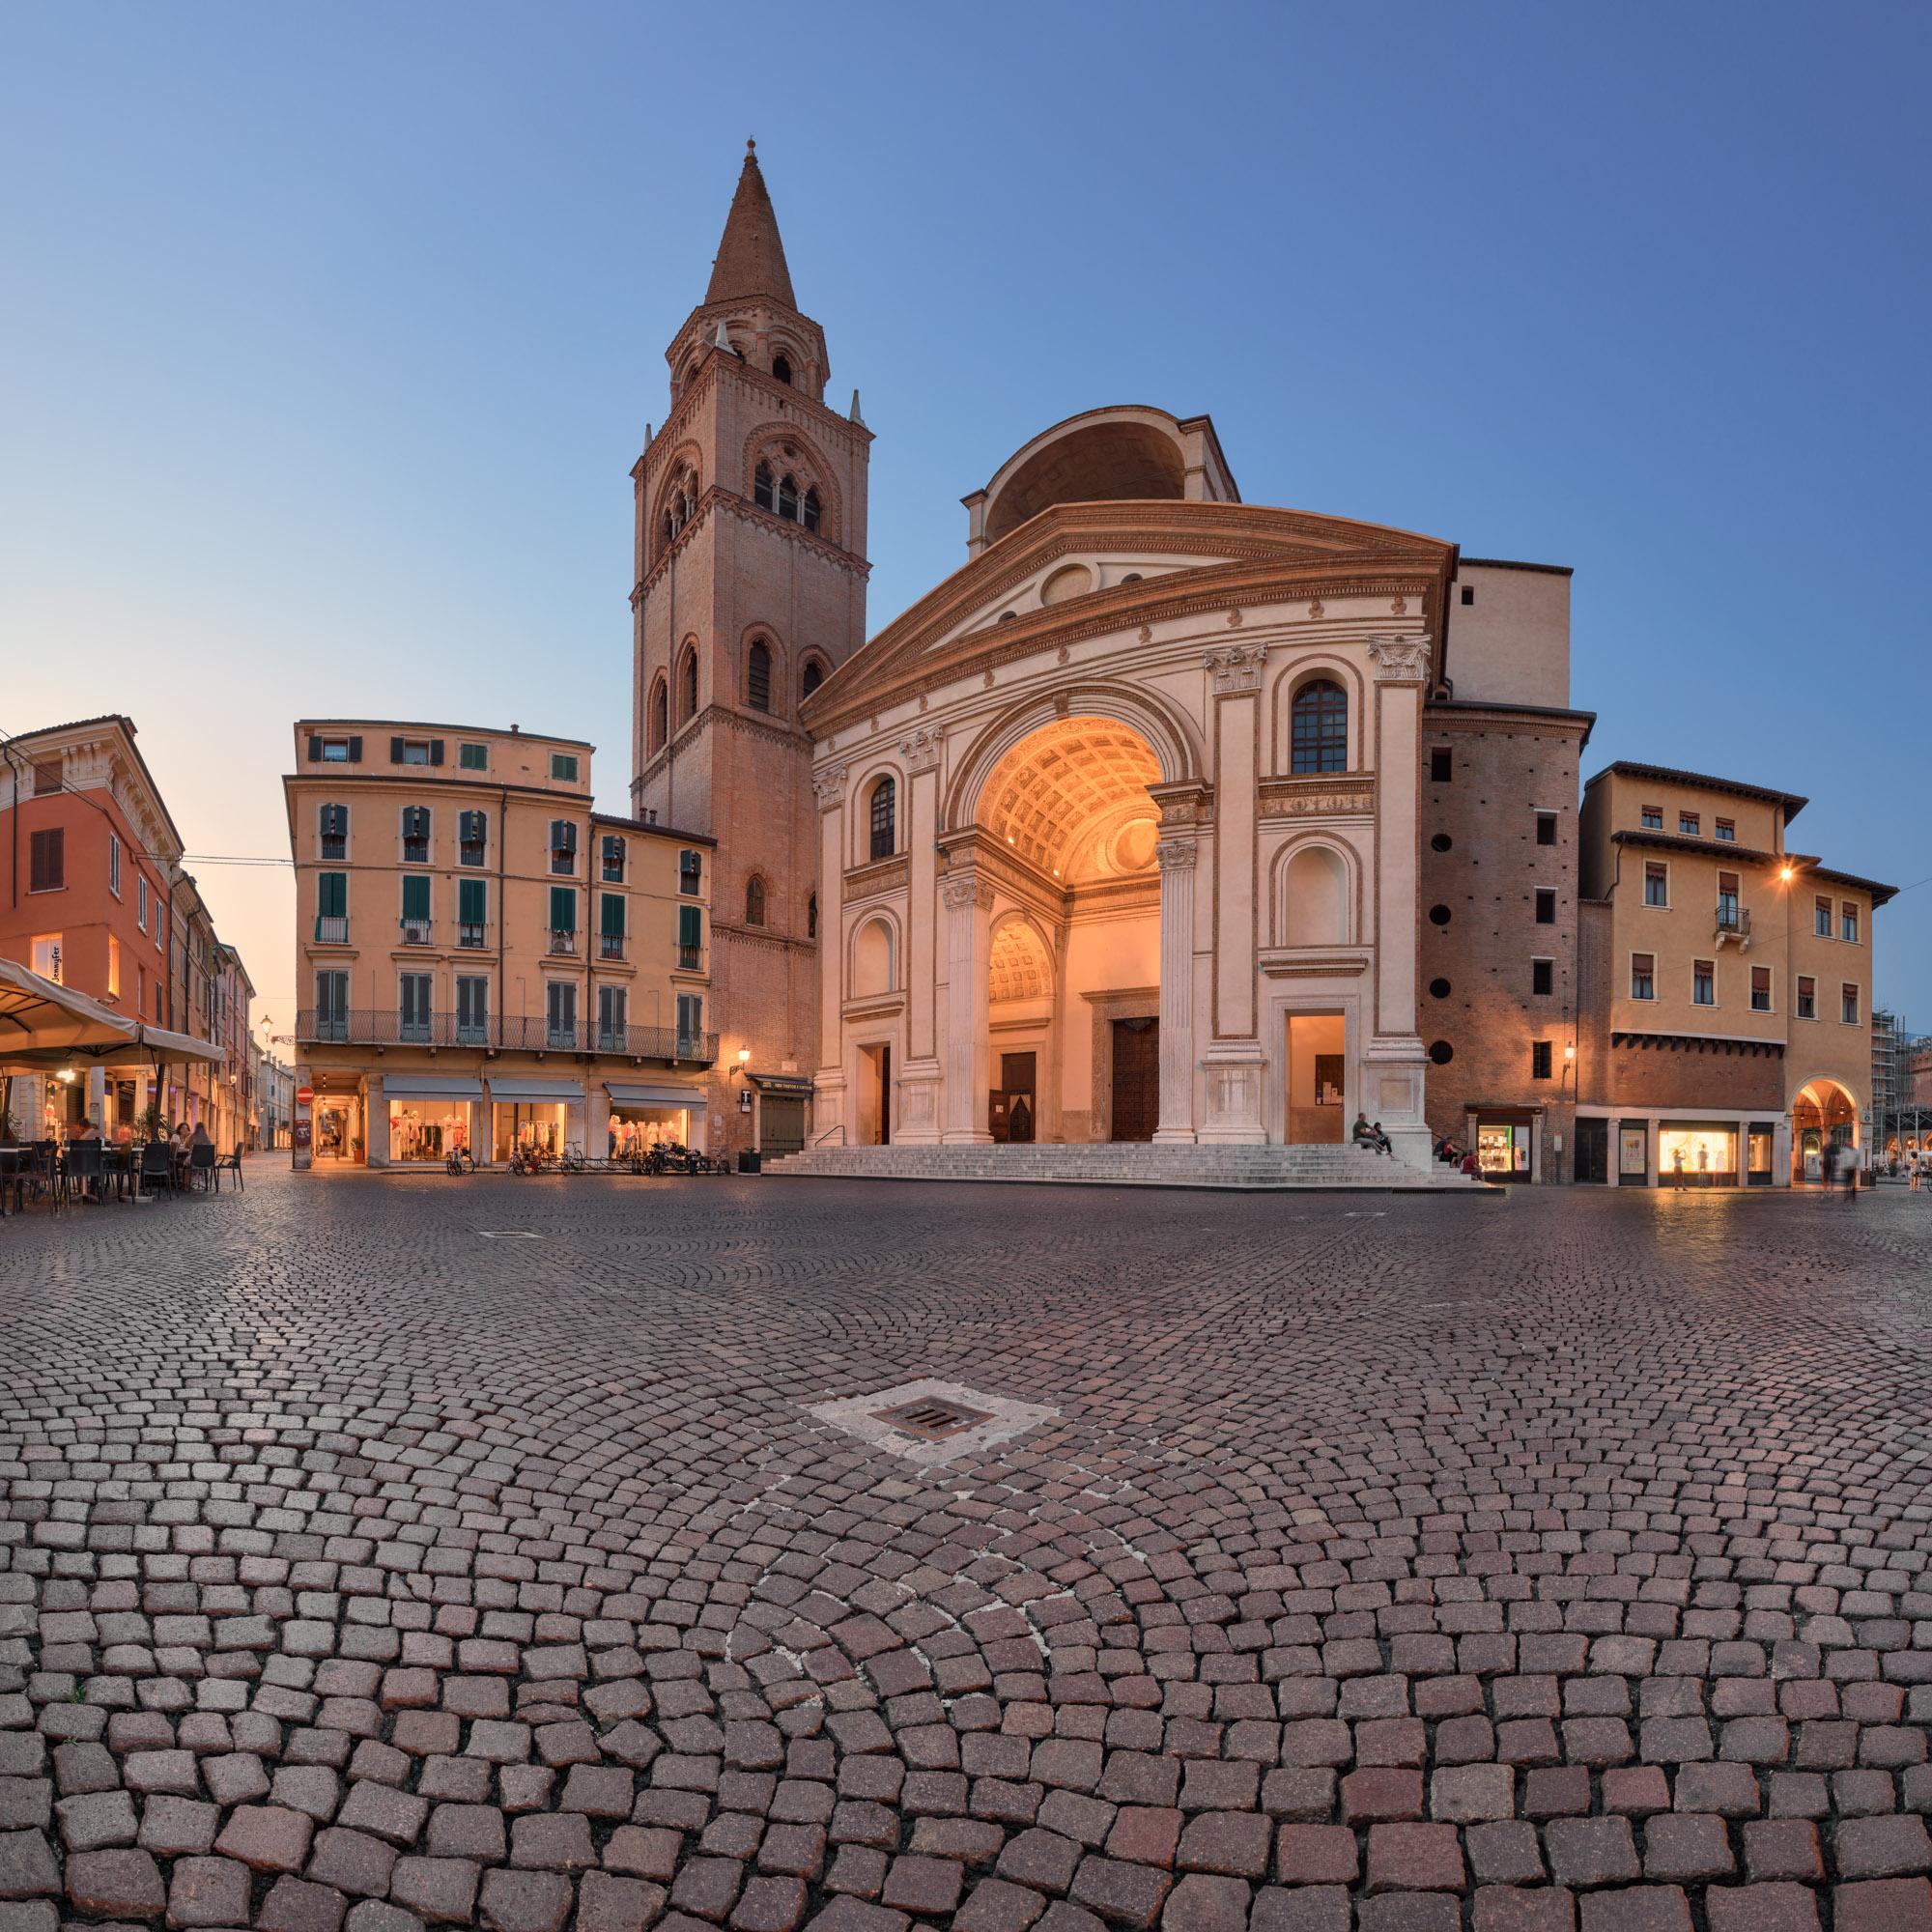 Basilica di Sant Andrea, Mantua, Lombardy, Italy